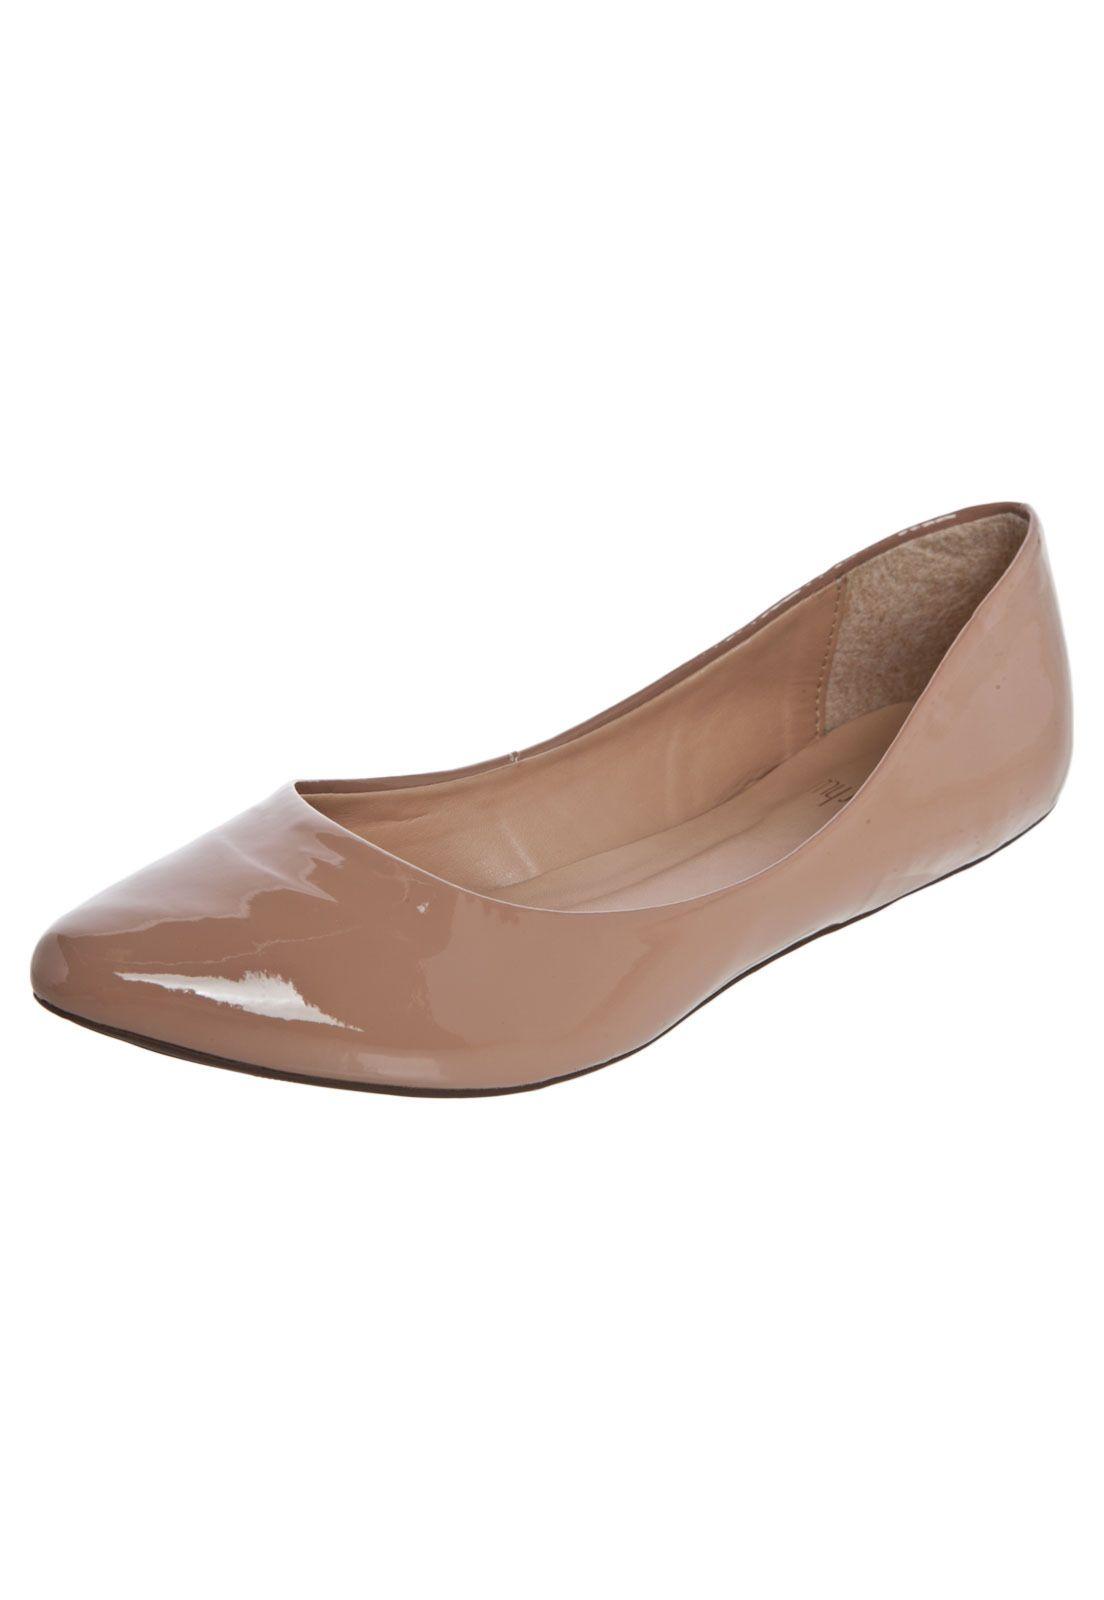 be795fffe2 Sapatilha My Shoes Básica Bico Fino Nude